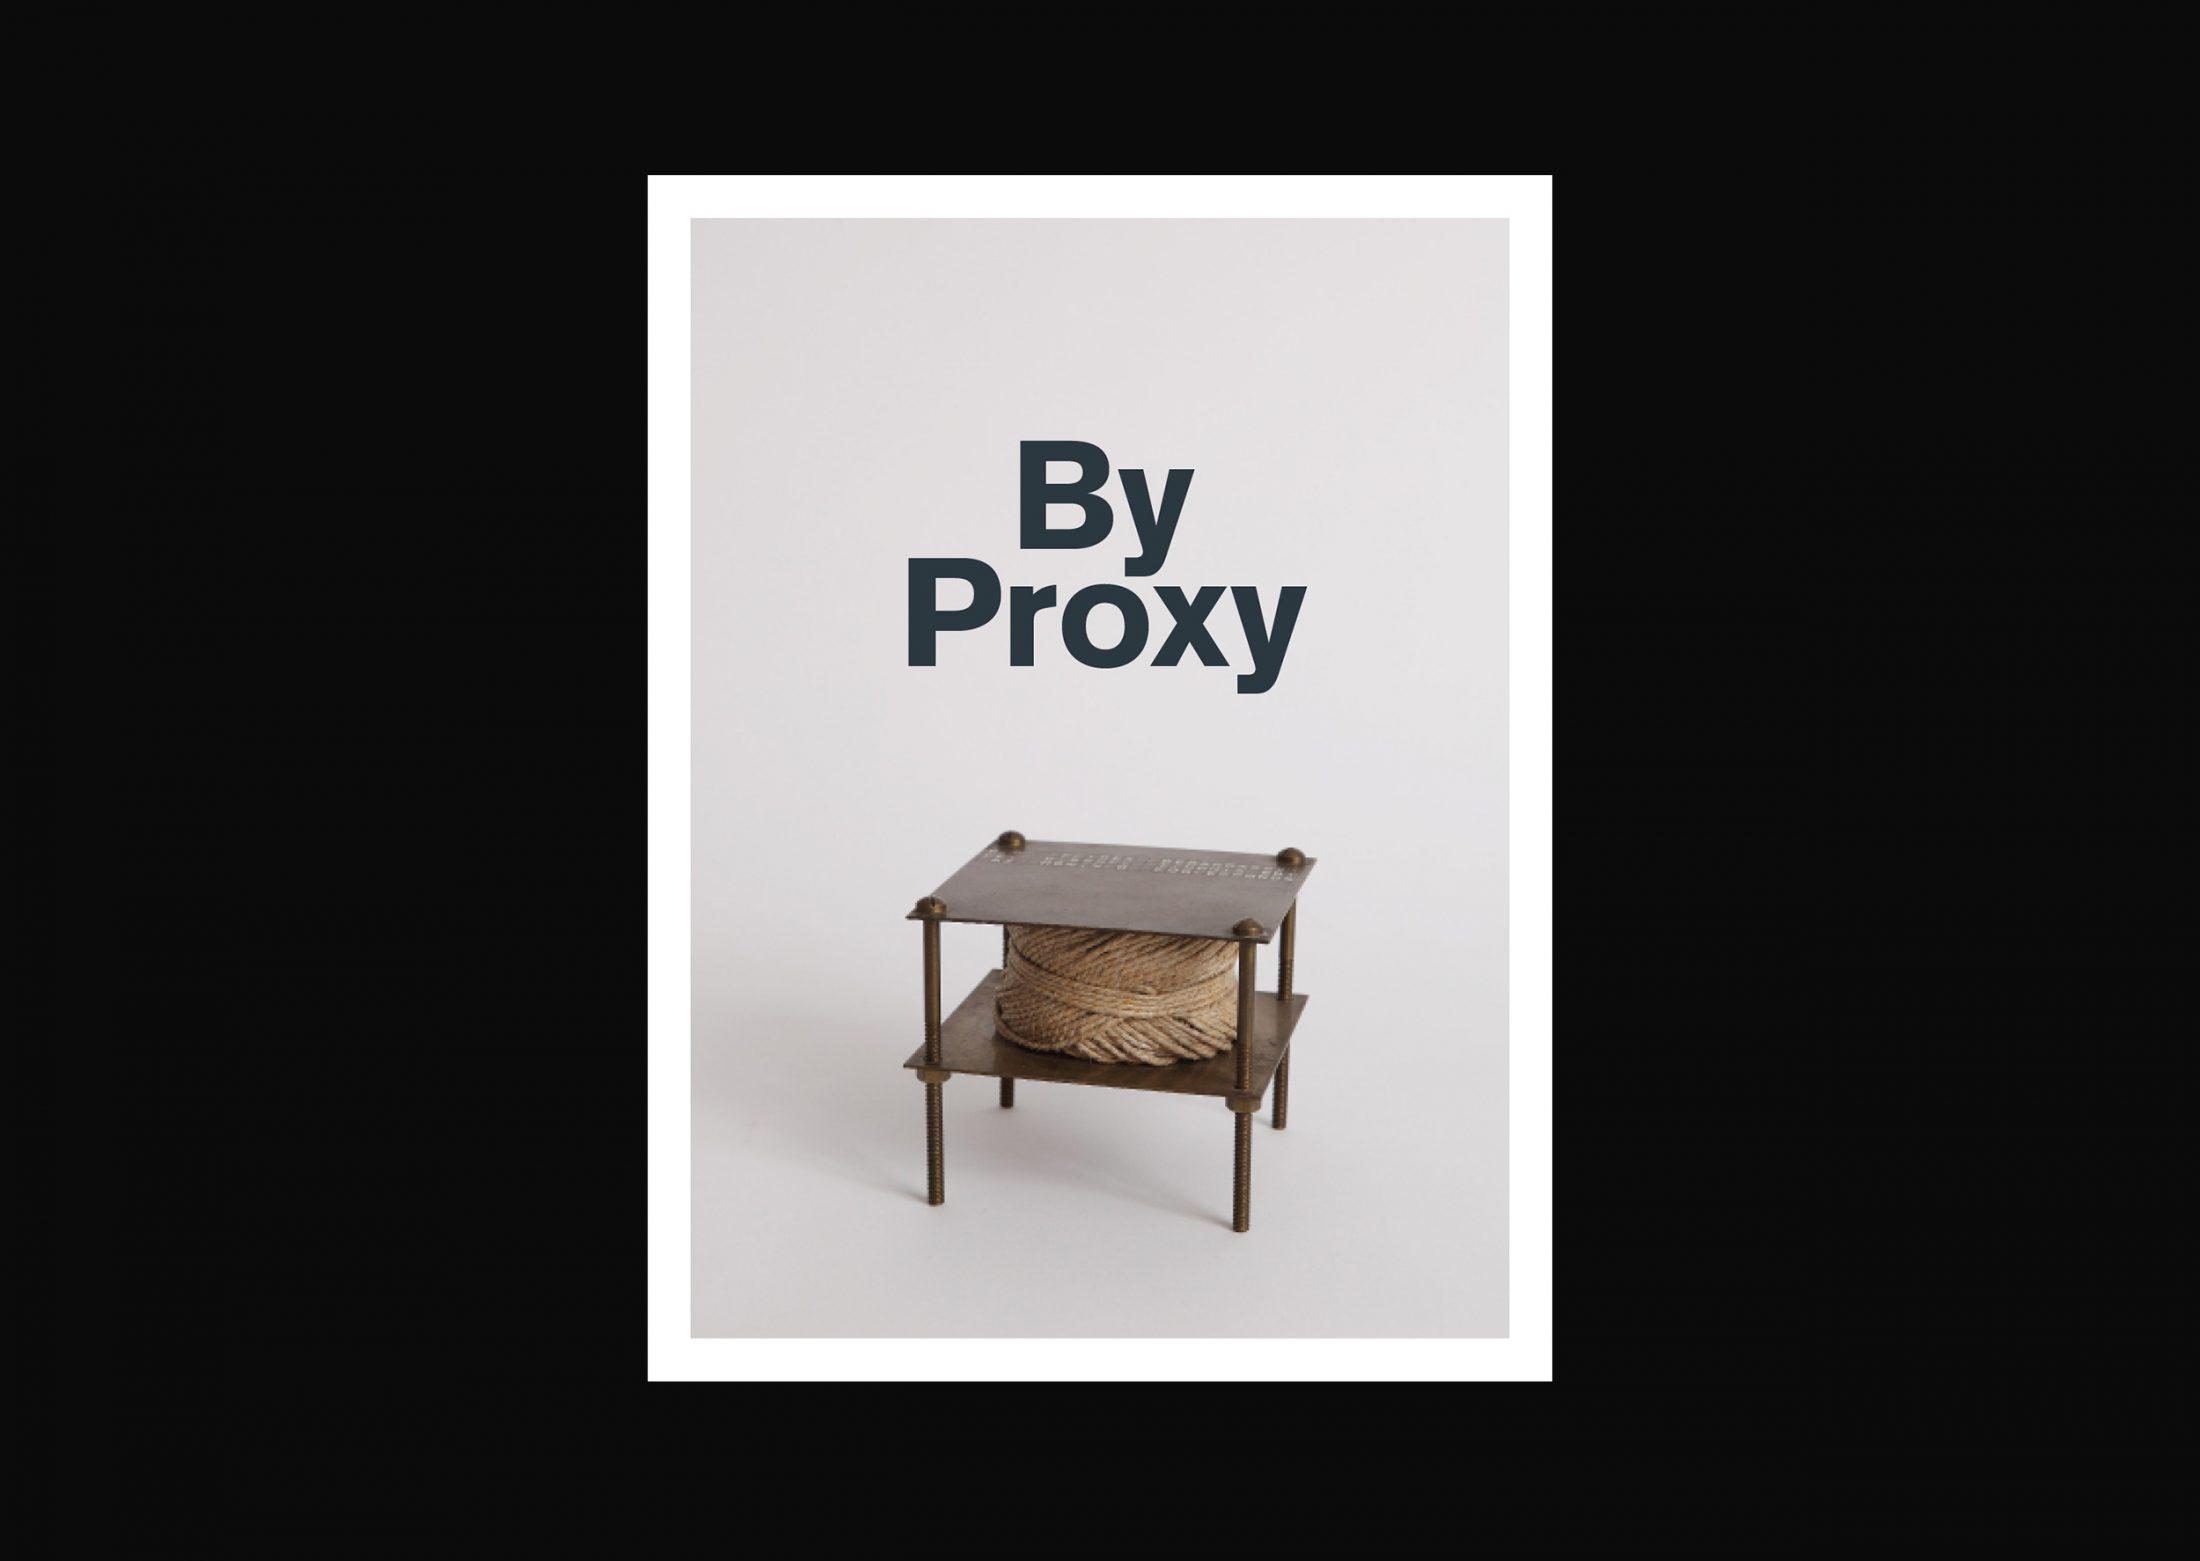 anthony_smyrski_by_proxy_10-2200×1561-1